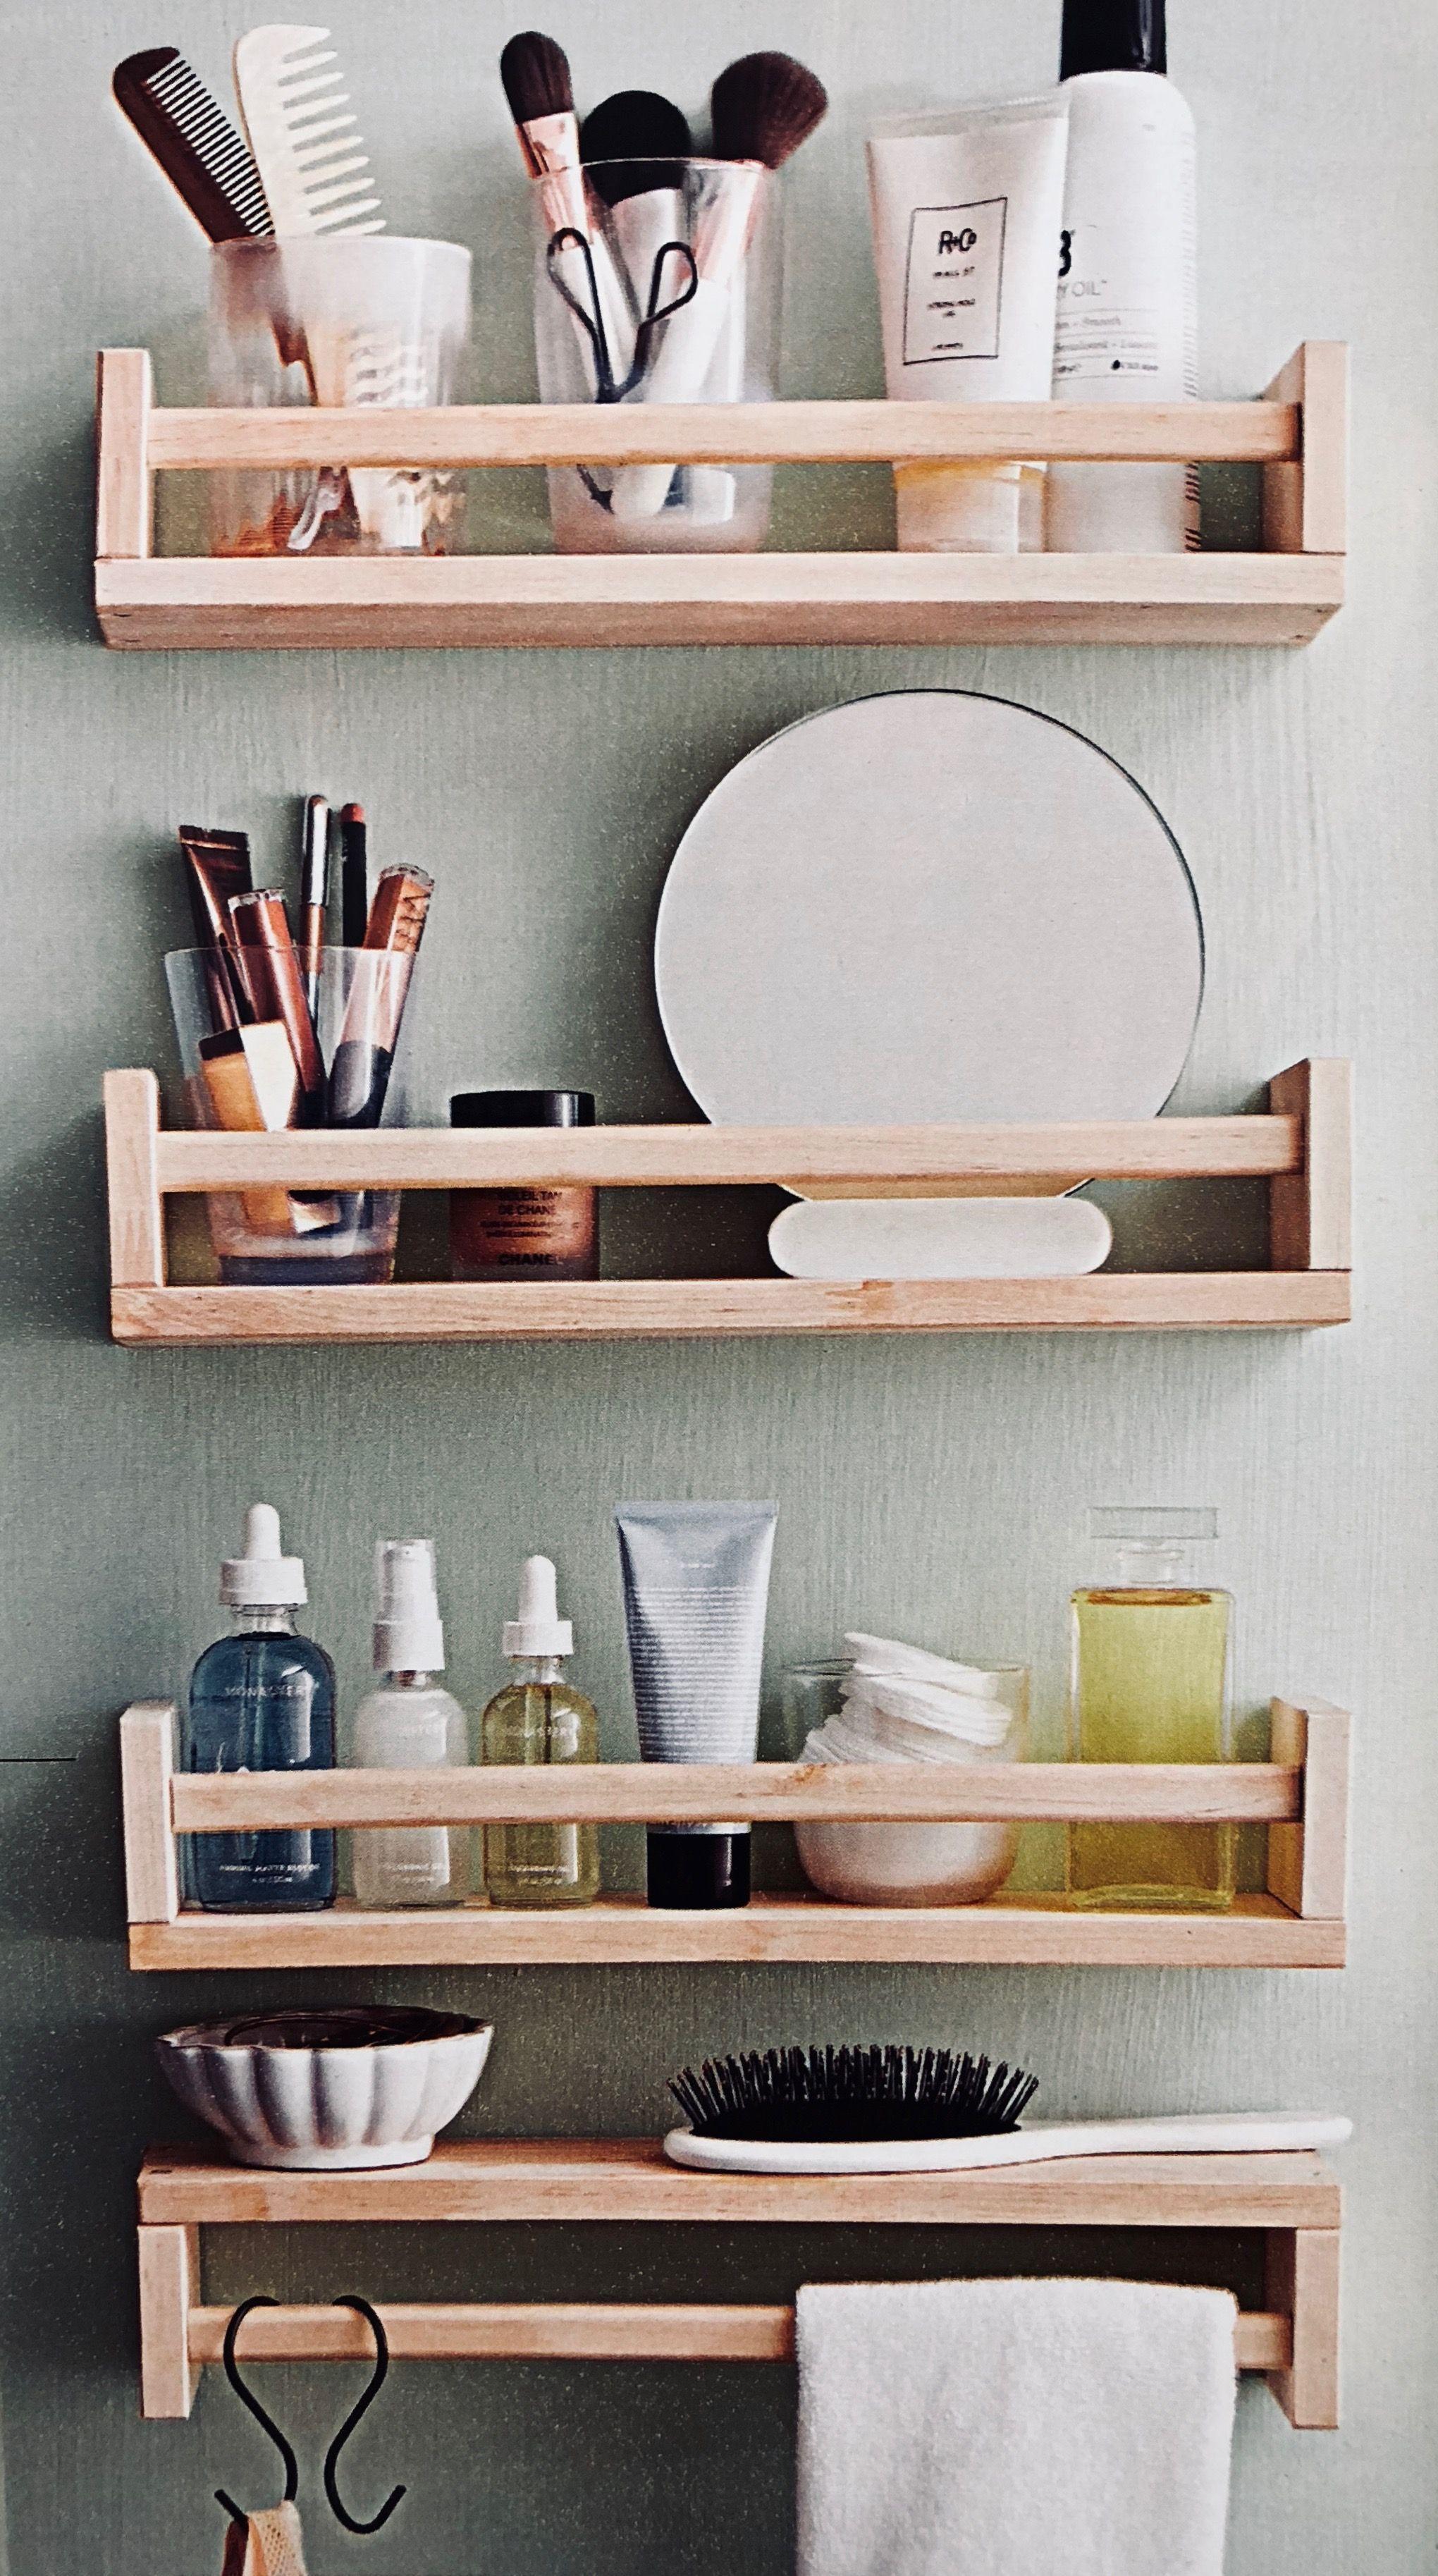 8 Bathroom Floating Shelves Design To Save Room Ikea Spice Rack